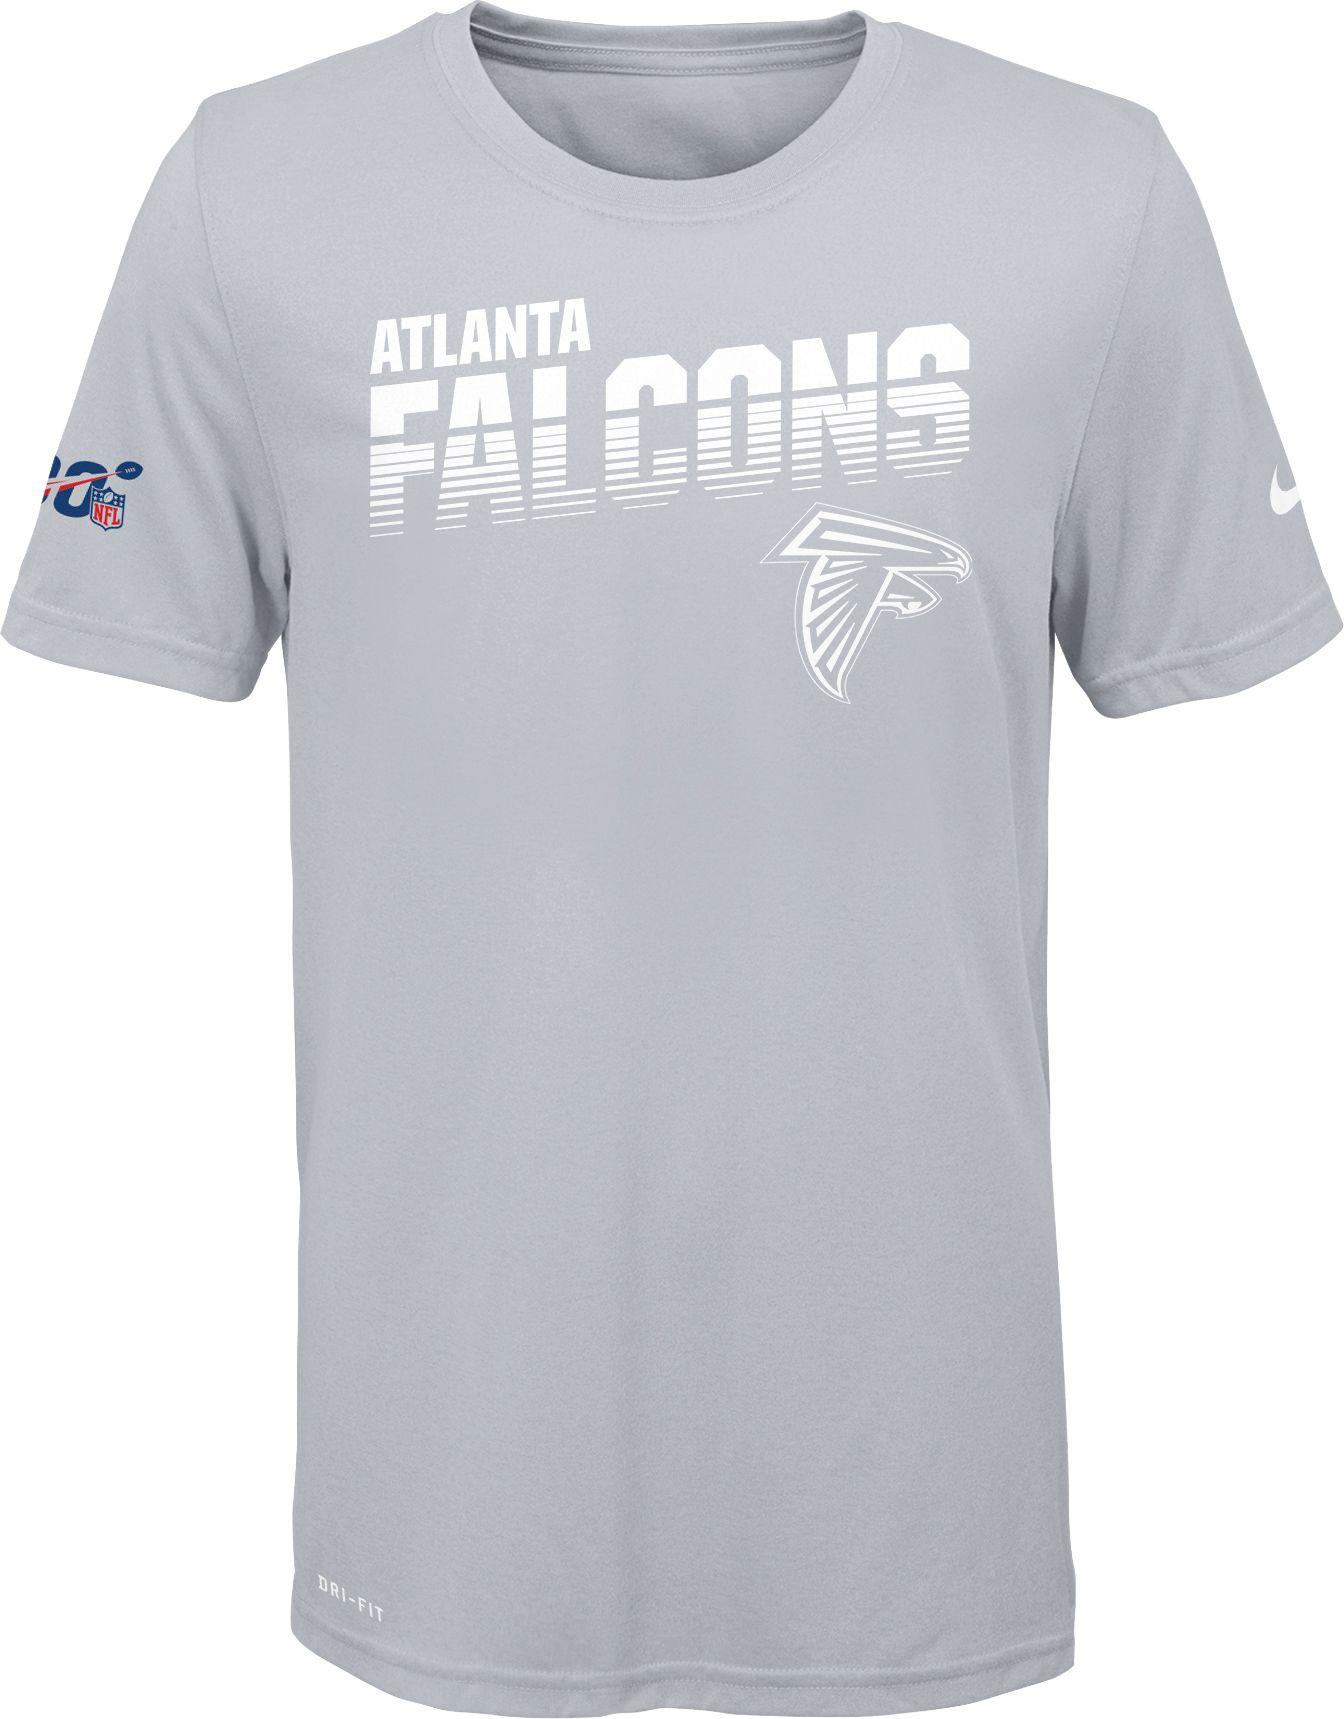 white atlanta falcons shirt